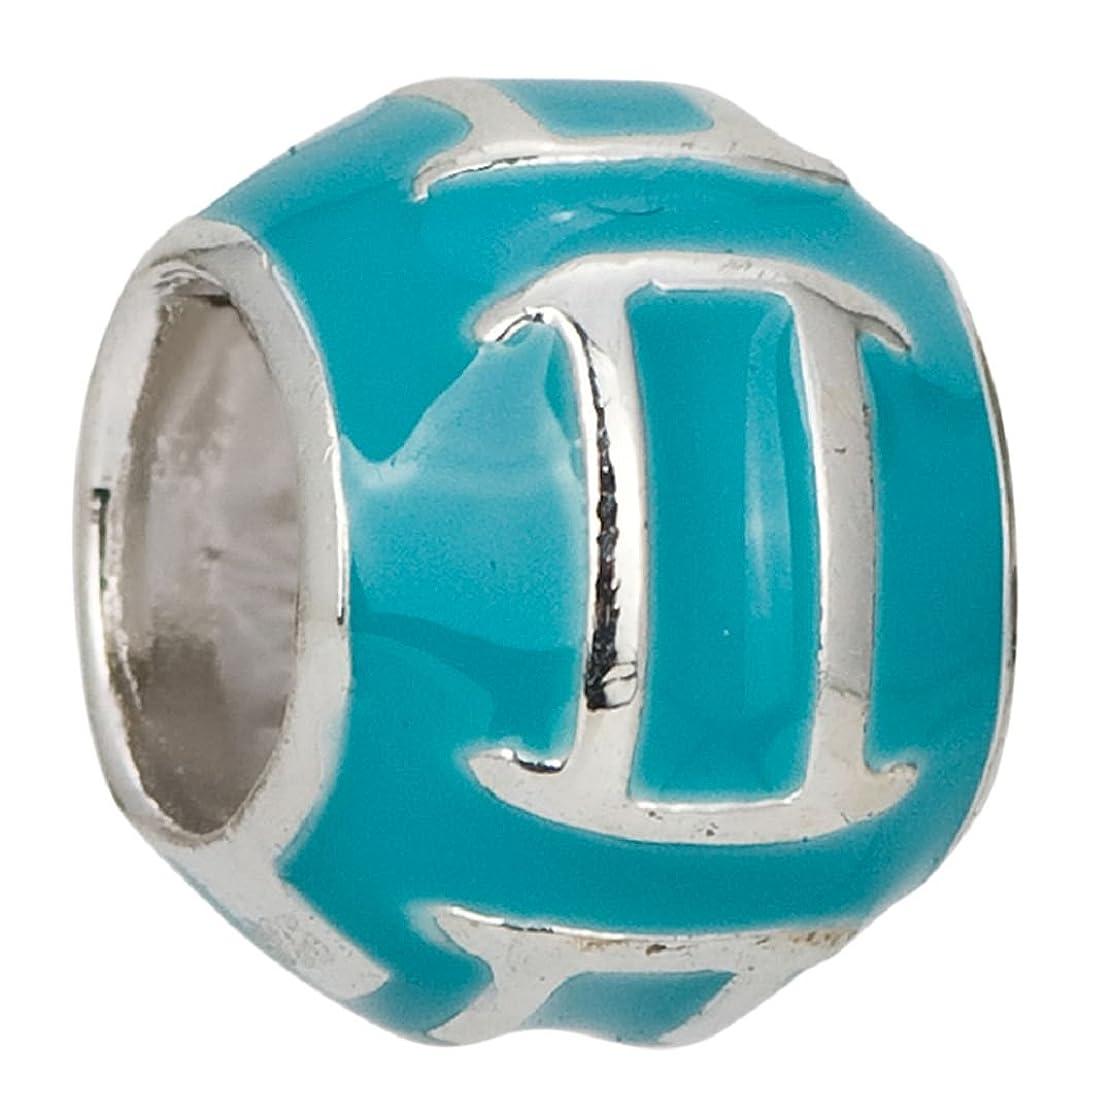 Zodiac Gemini Turquoise Enamel Symbols 925 Sterling Silver Charm Bead Fits European Charms